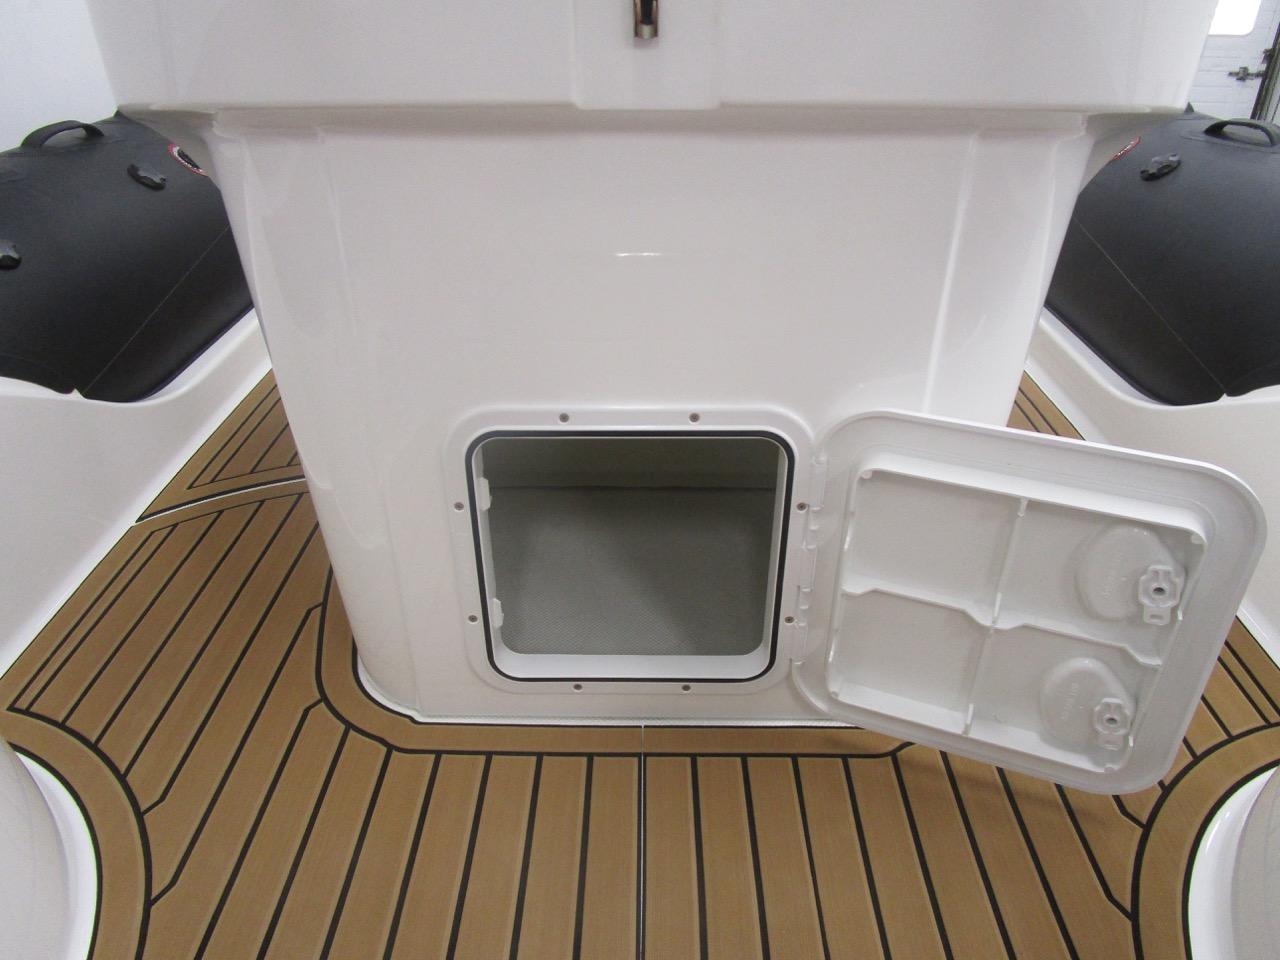 GRAND G850 RIB helm seat lower locker open